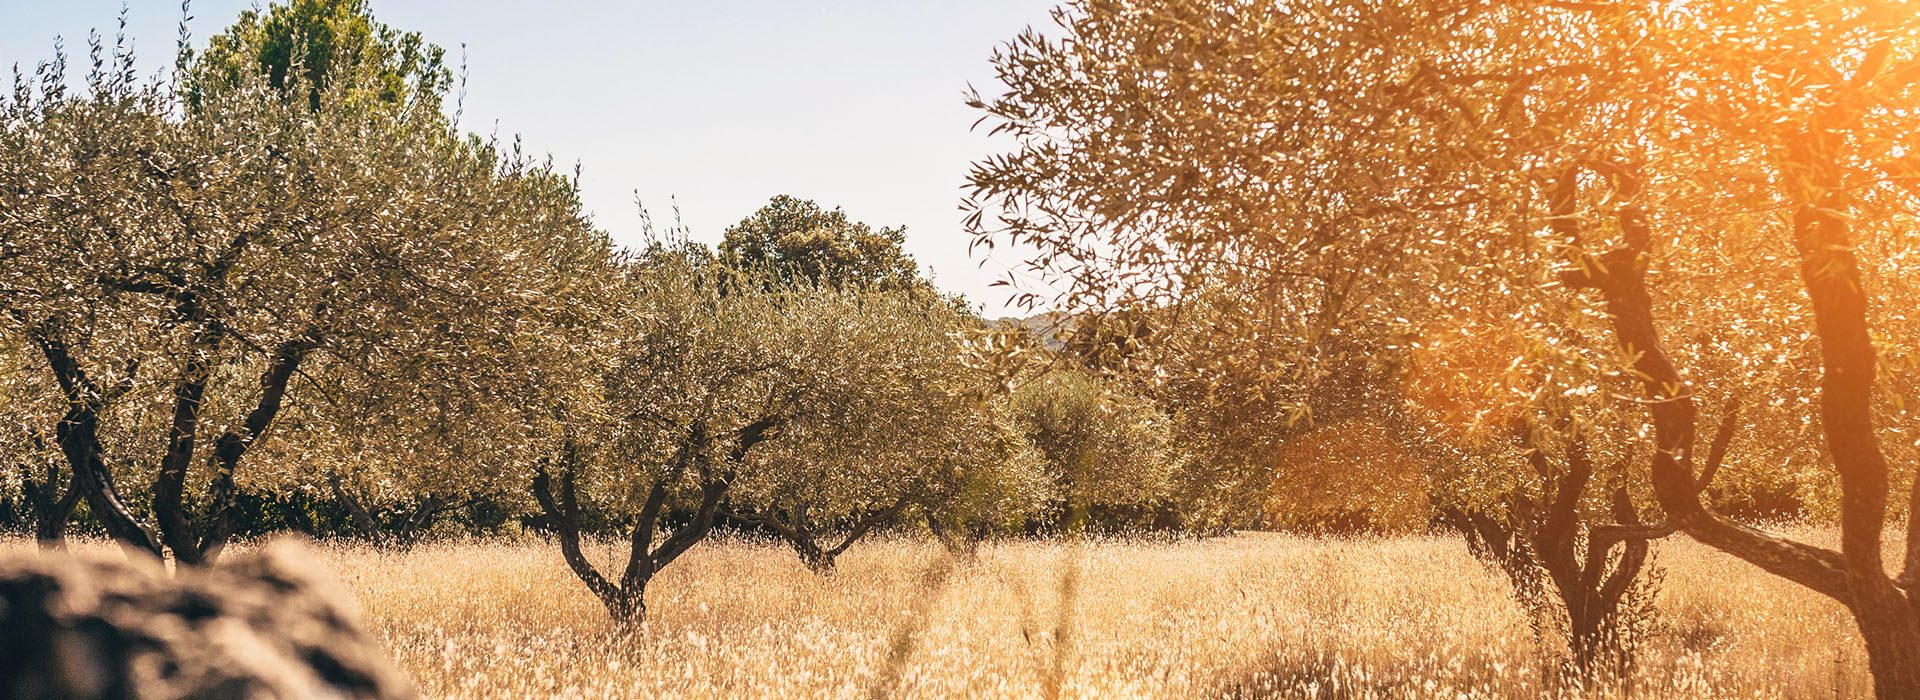 soleil champ olivier